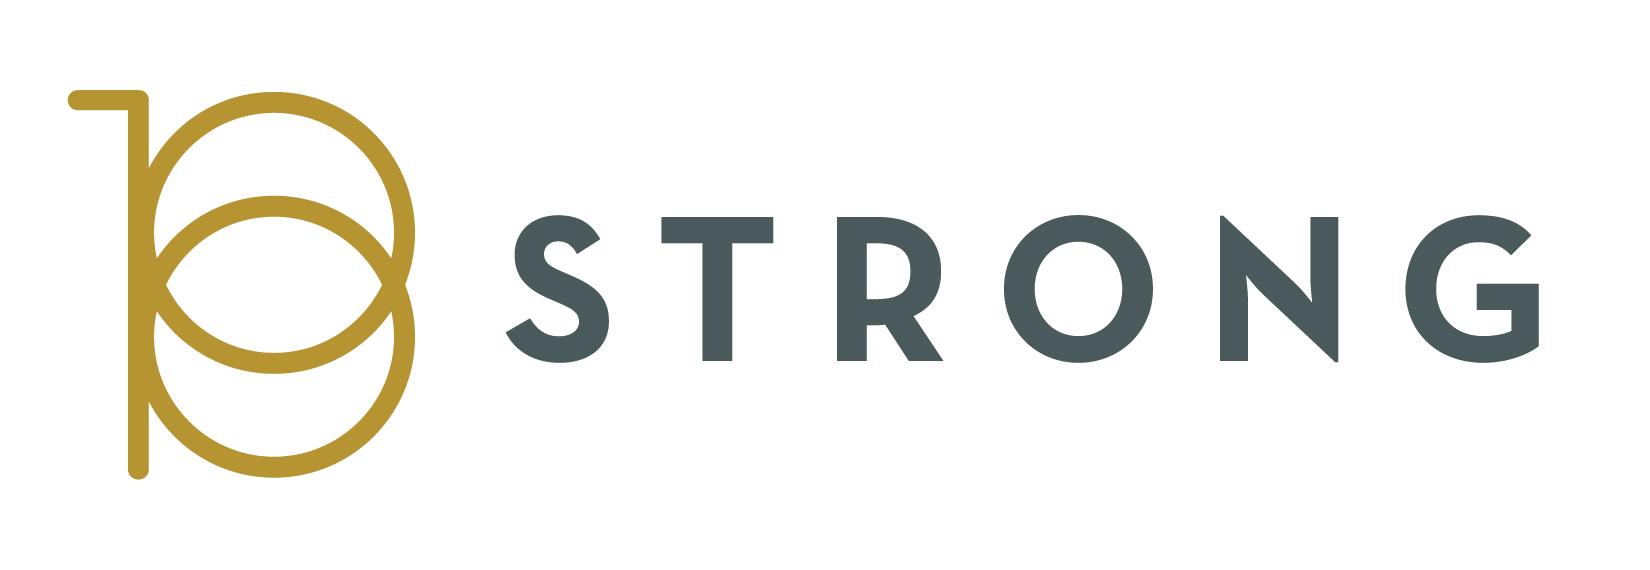 BB Logo - B Strong.jpg